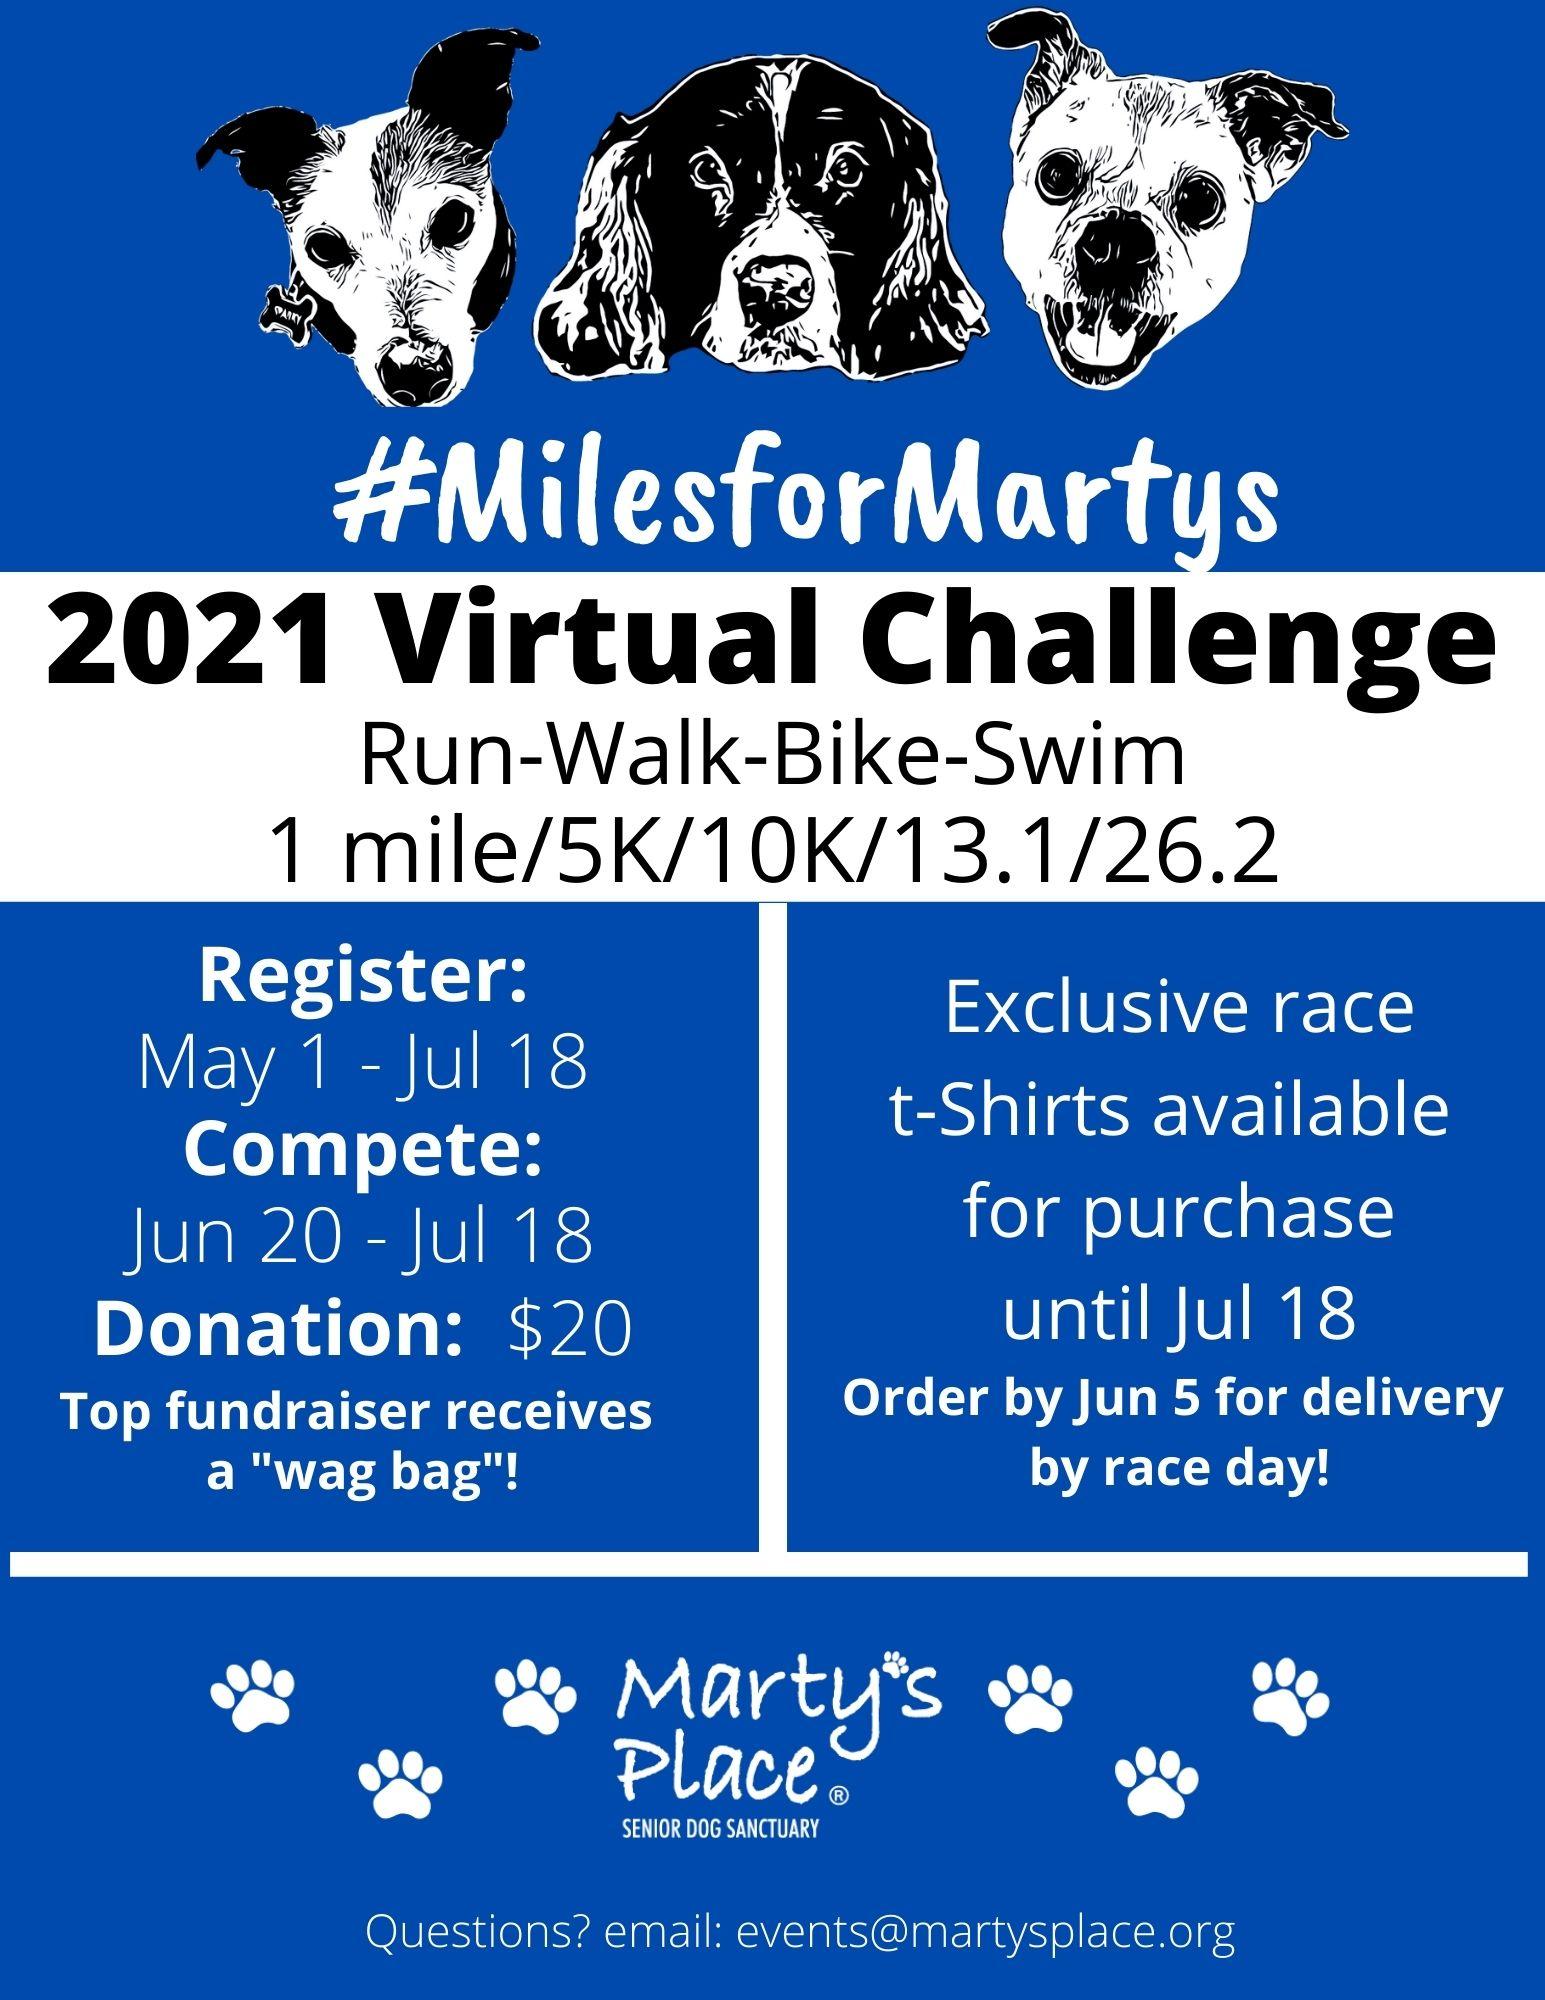 2021 Virtual Challenge